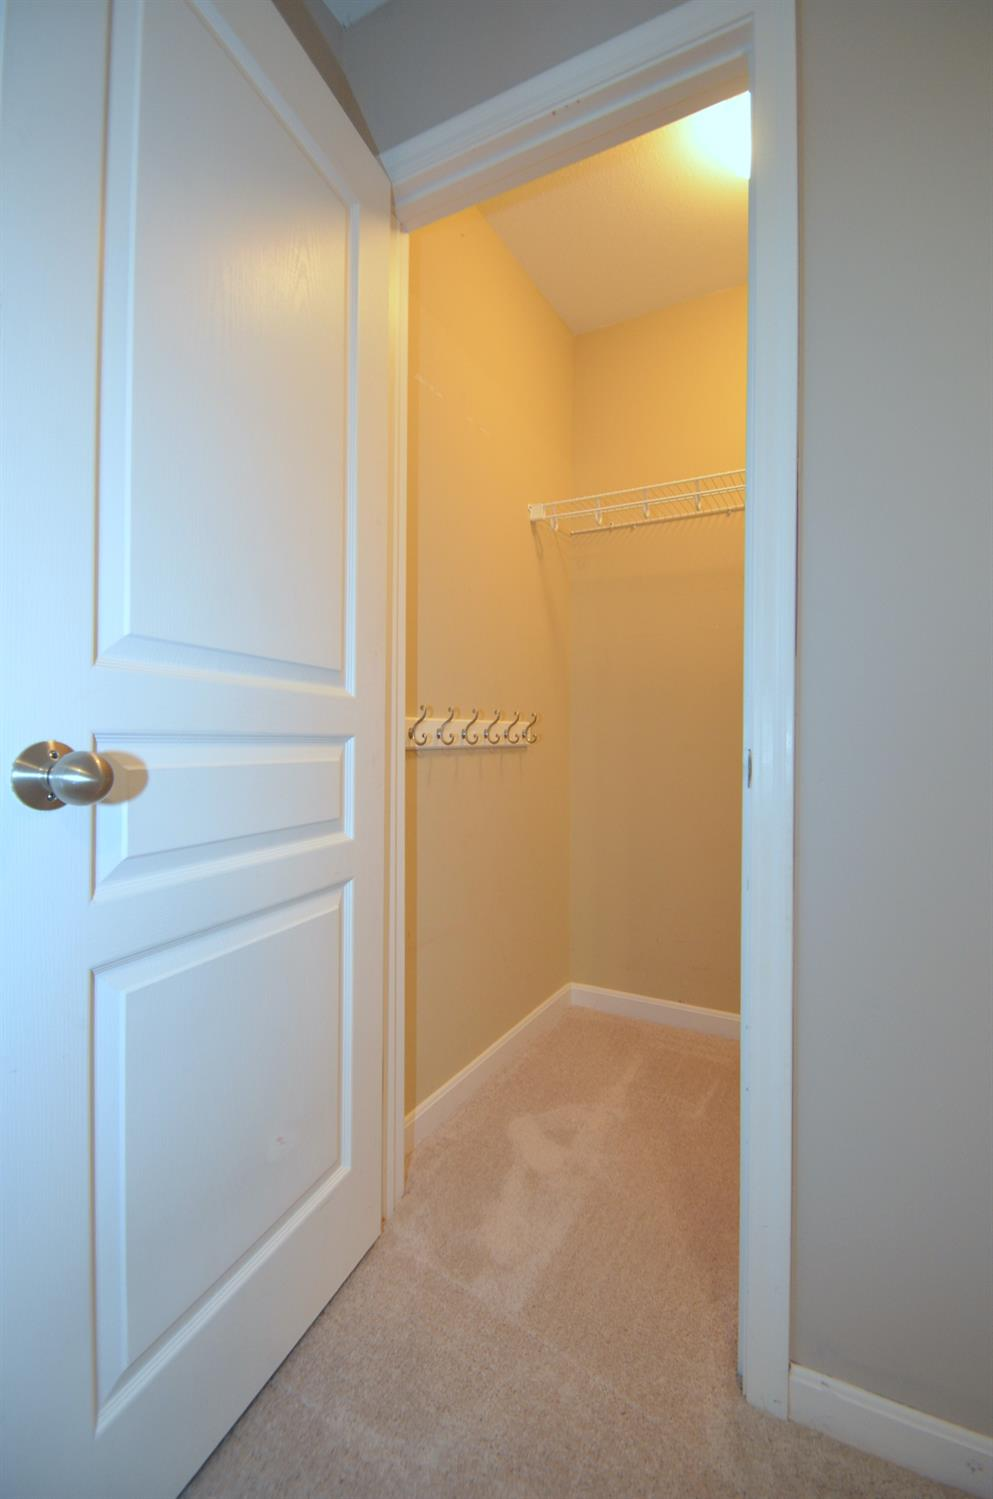 Bedroom 2. View of one of the bedroom walk-in closets.